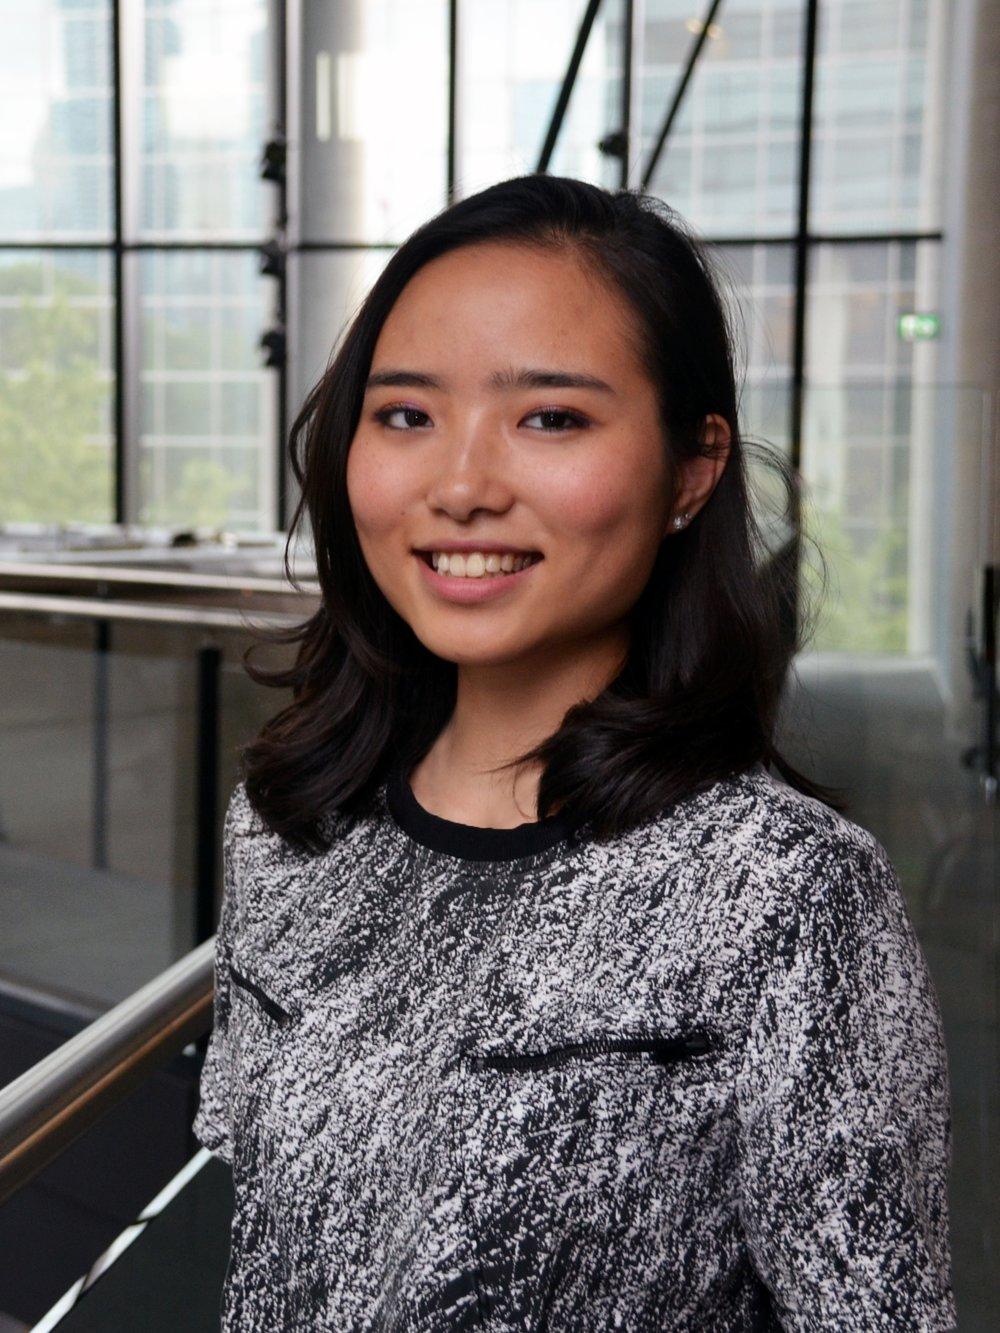 Vanessa Khoung Computer Science & Statistics 2019  Corporate Strategy and Sponsorship  vanessa@utat.ca